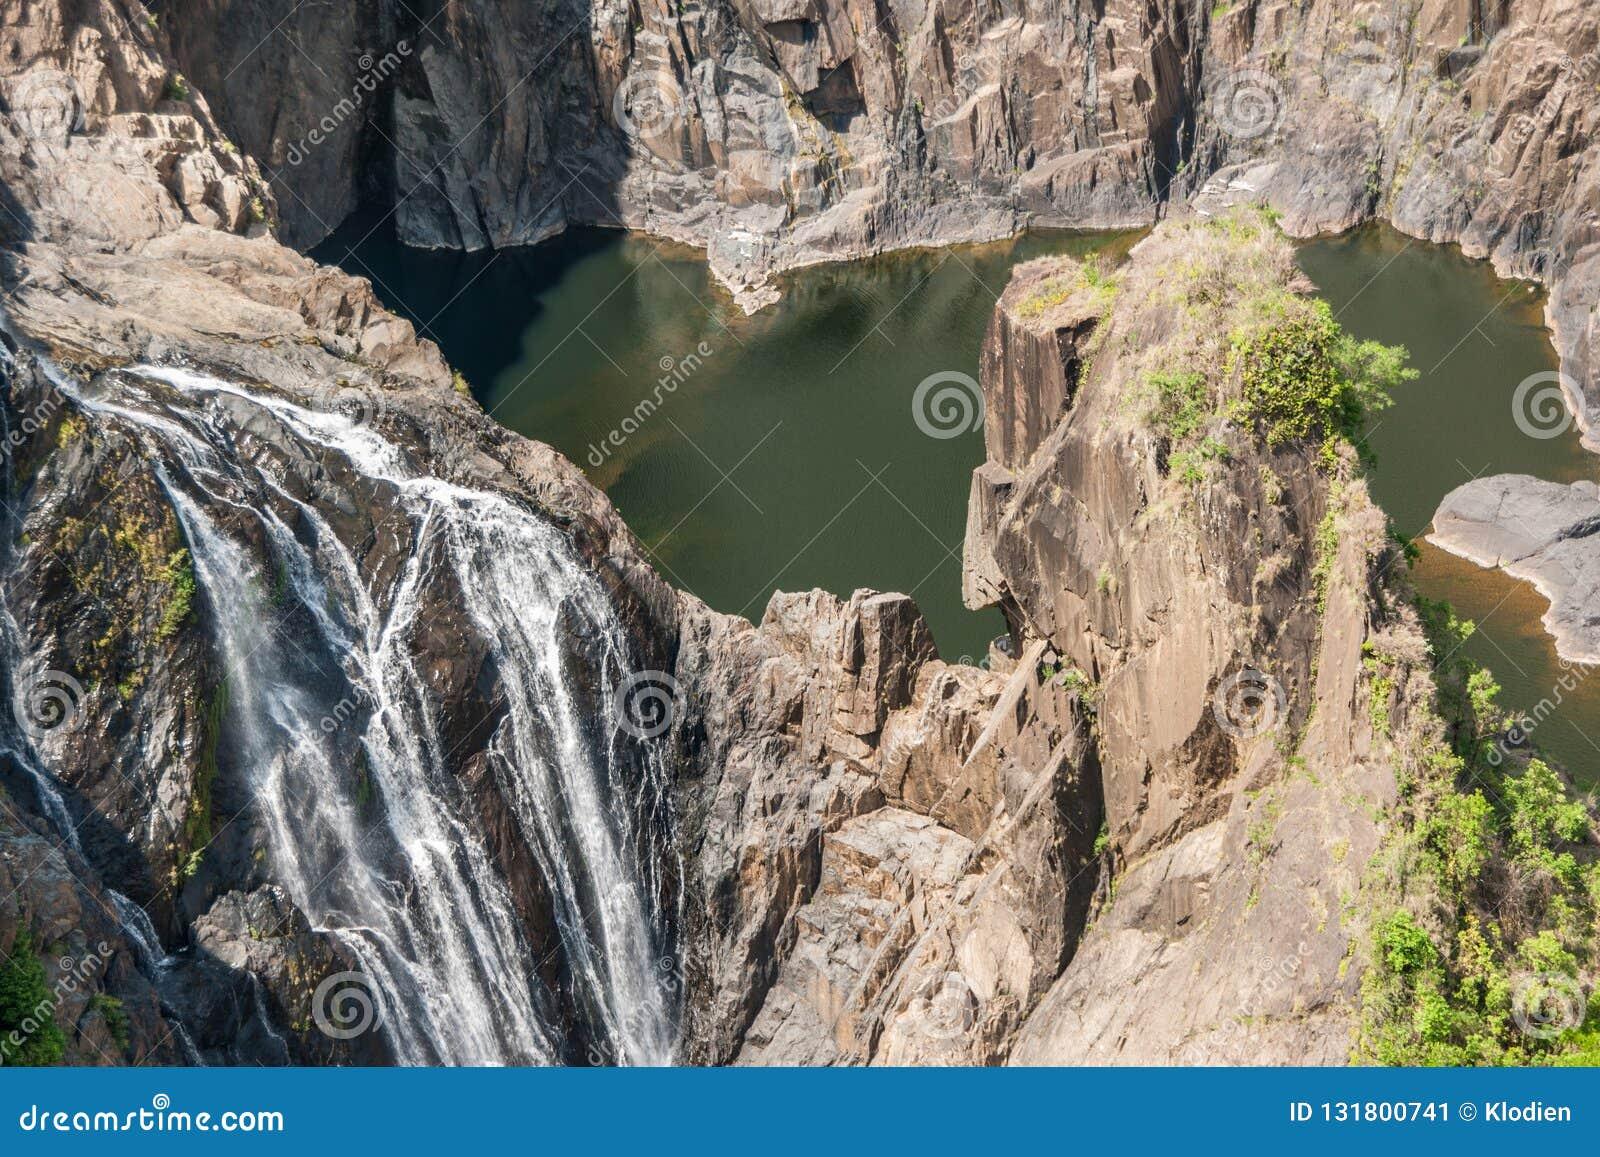 Closeup Barron Falls i Barron Gorge National Park, Kuranda Australien